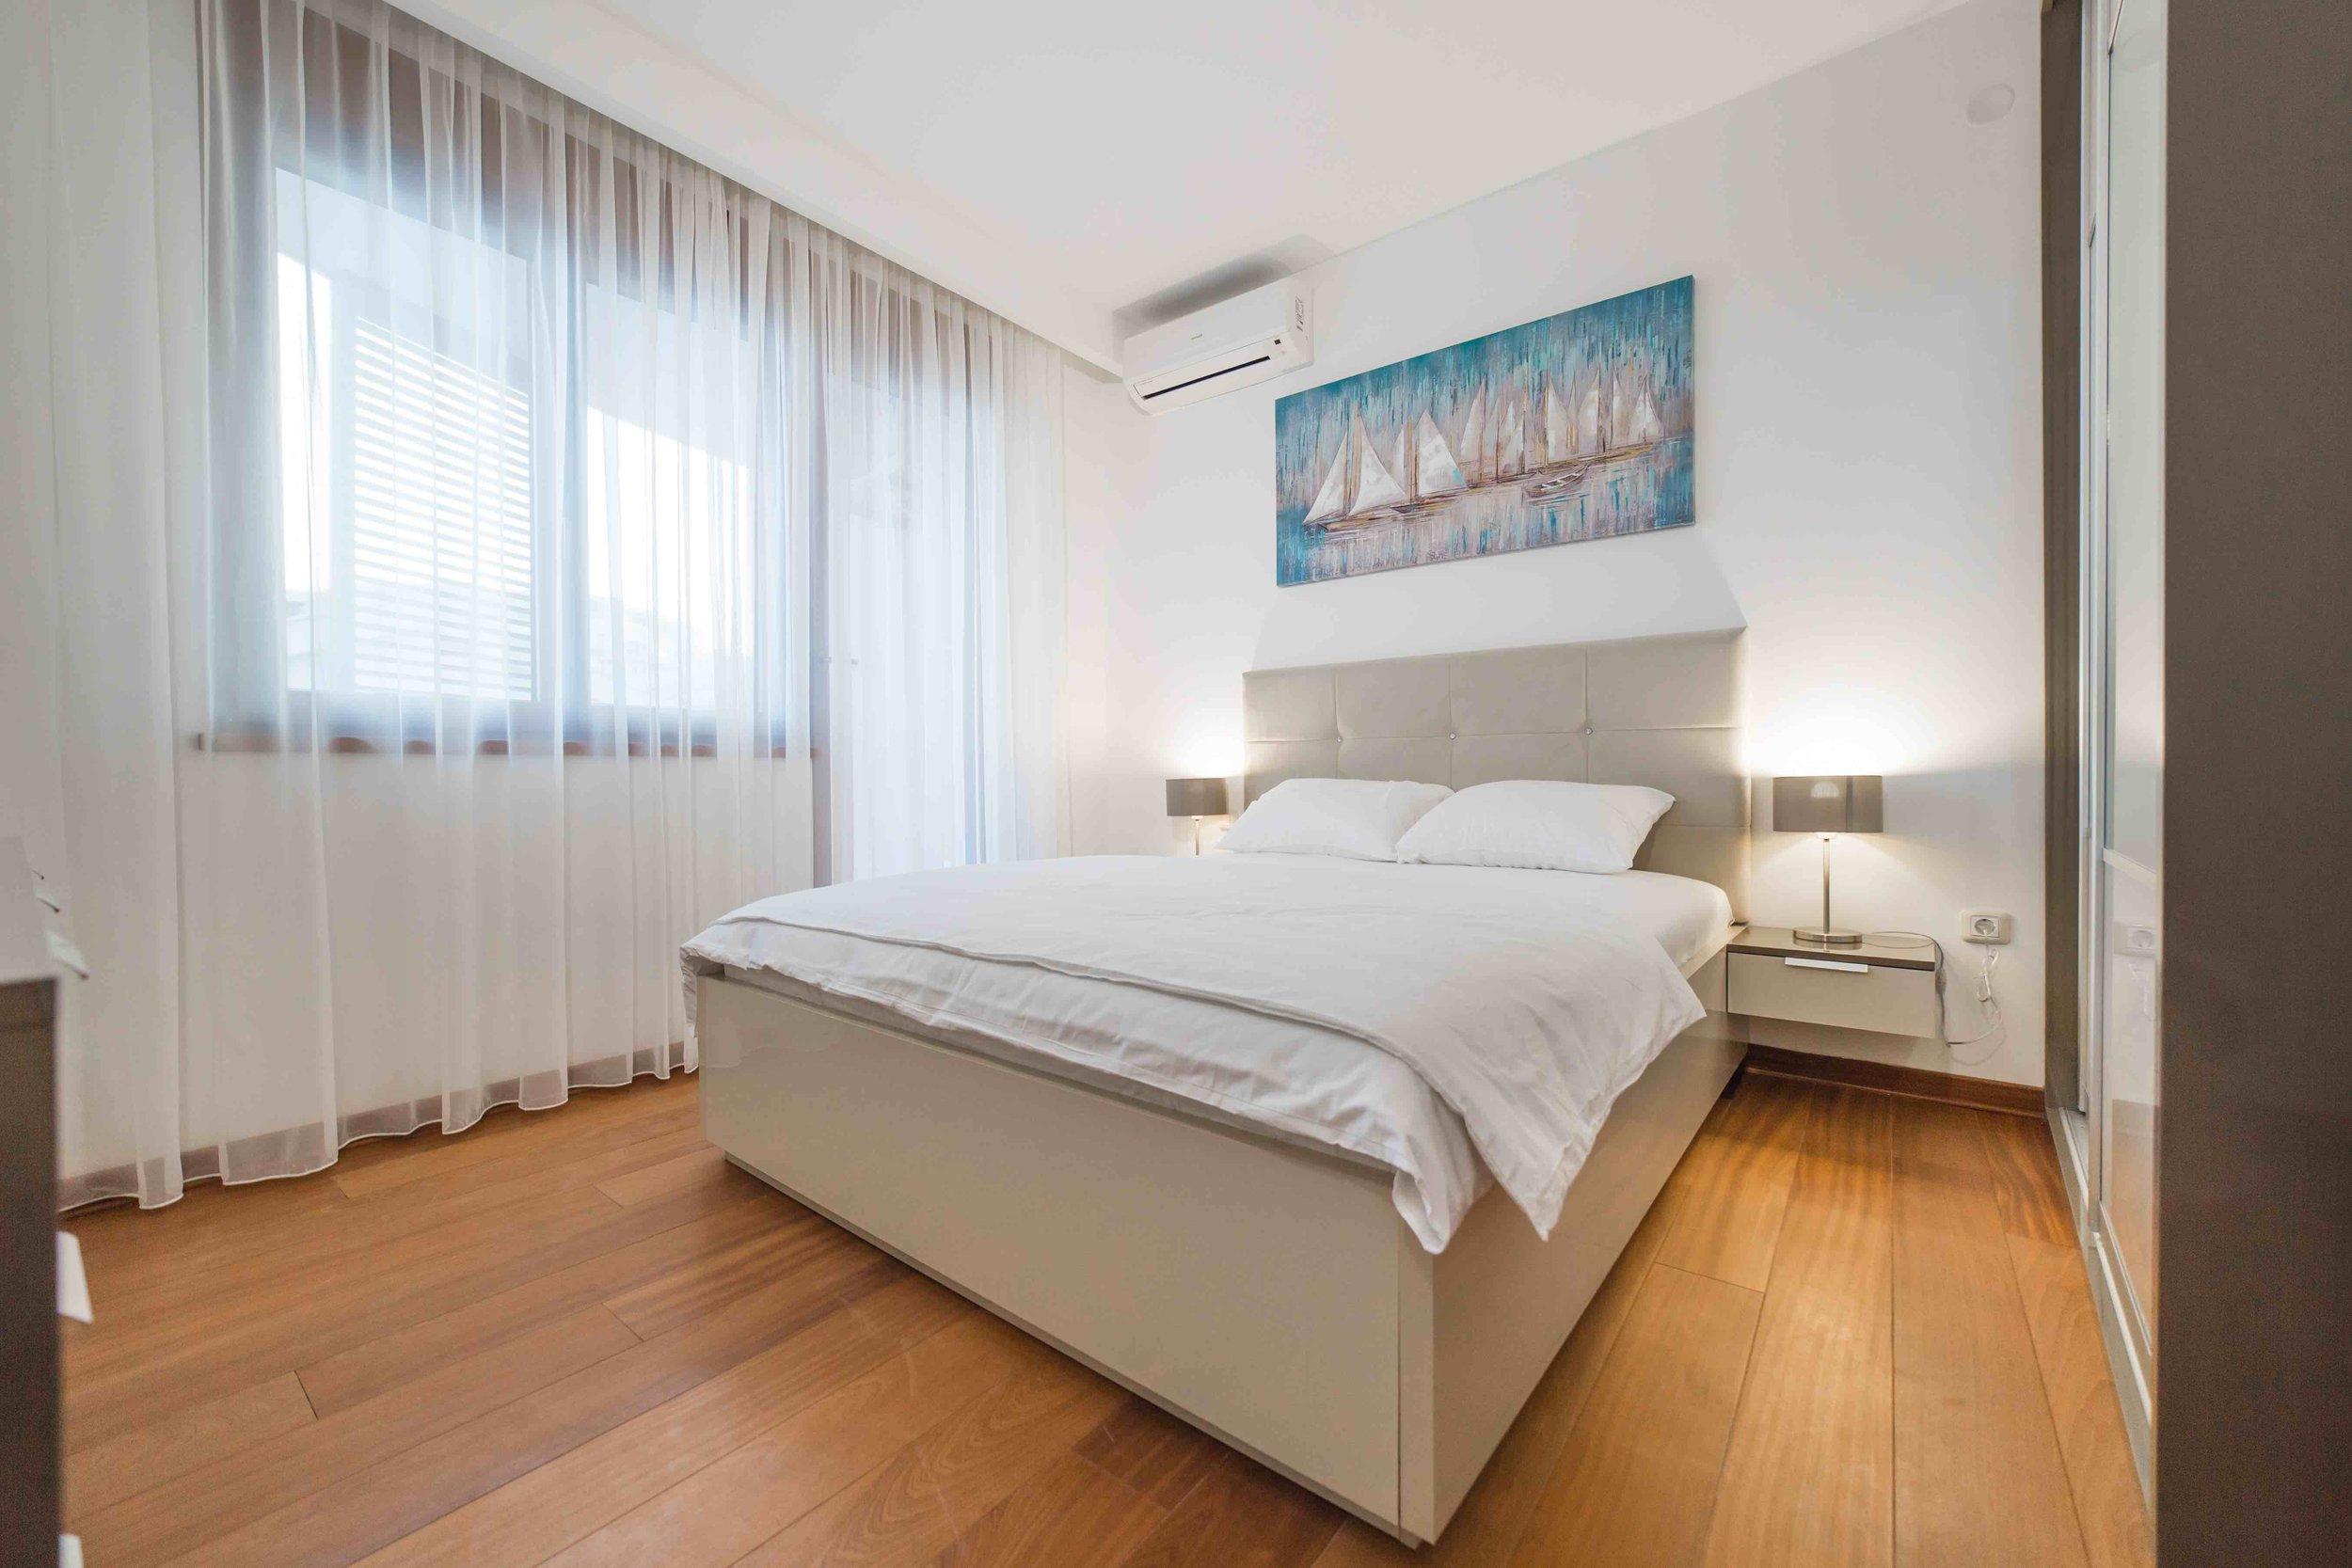 Aparthotel Апартотель | Anatolia |Becici Бечичи | Budva Будва | Montenegro Черногория | Apartments Апартаменты | Rents Аренда 10.jpg